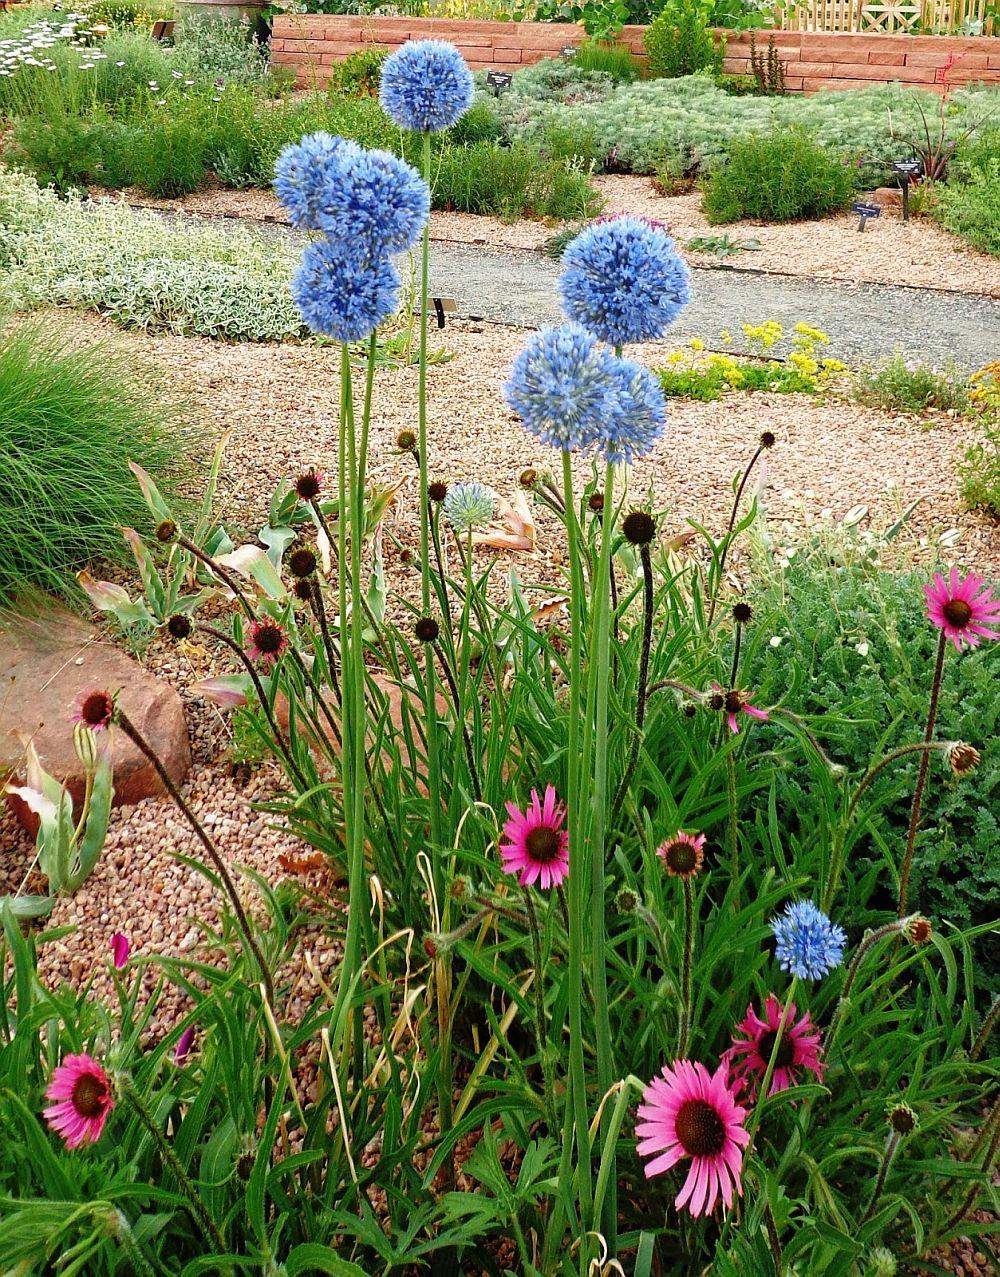 adelaparvu.com despre Allium ceapa decorativa, text Carli Marian 2